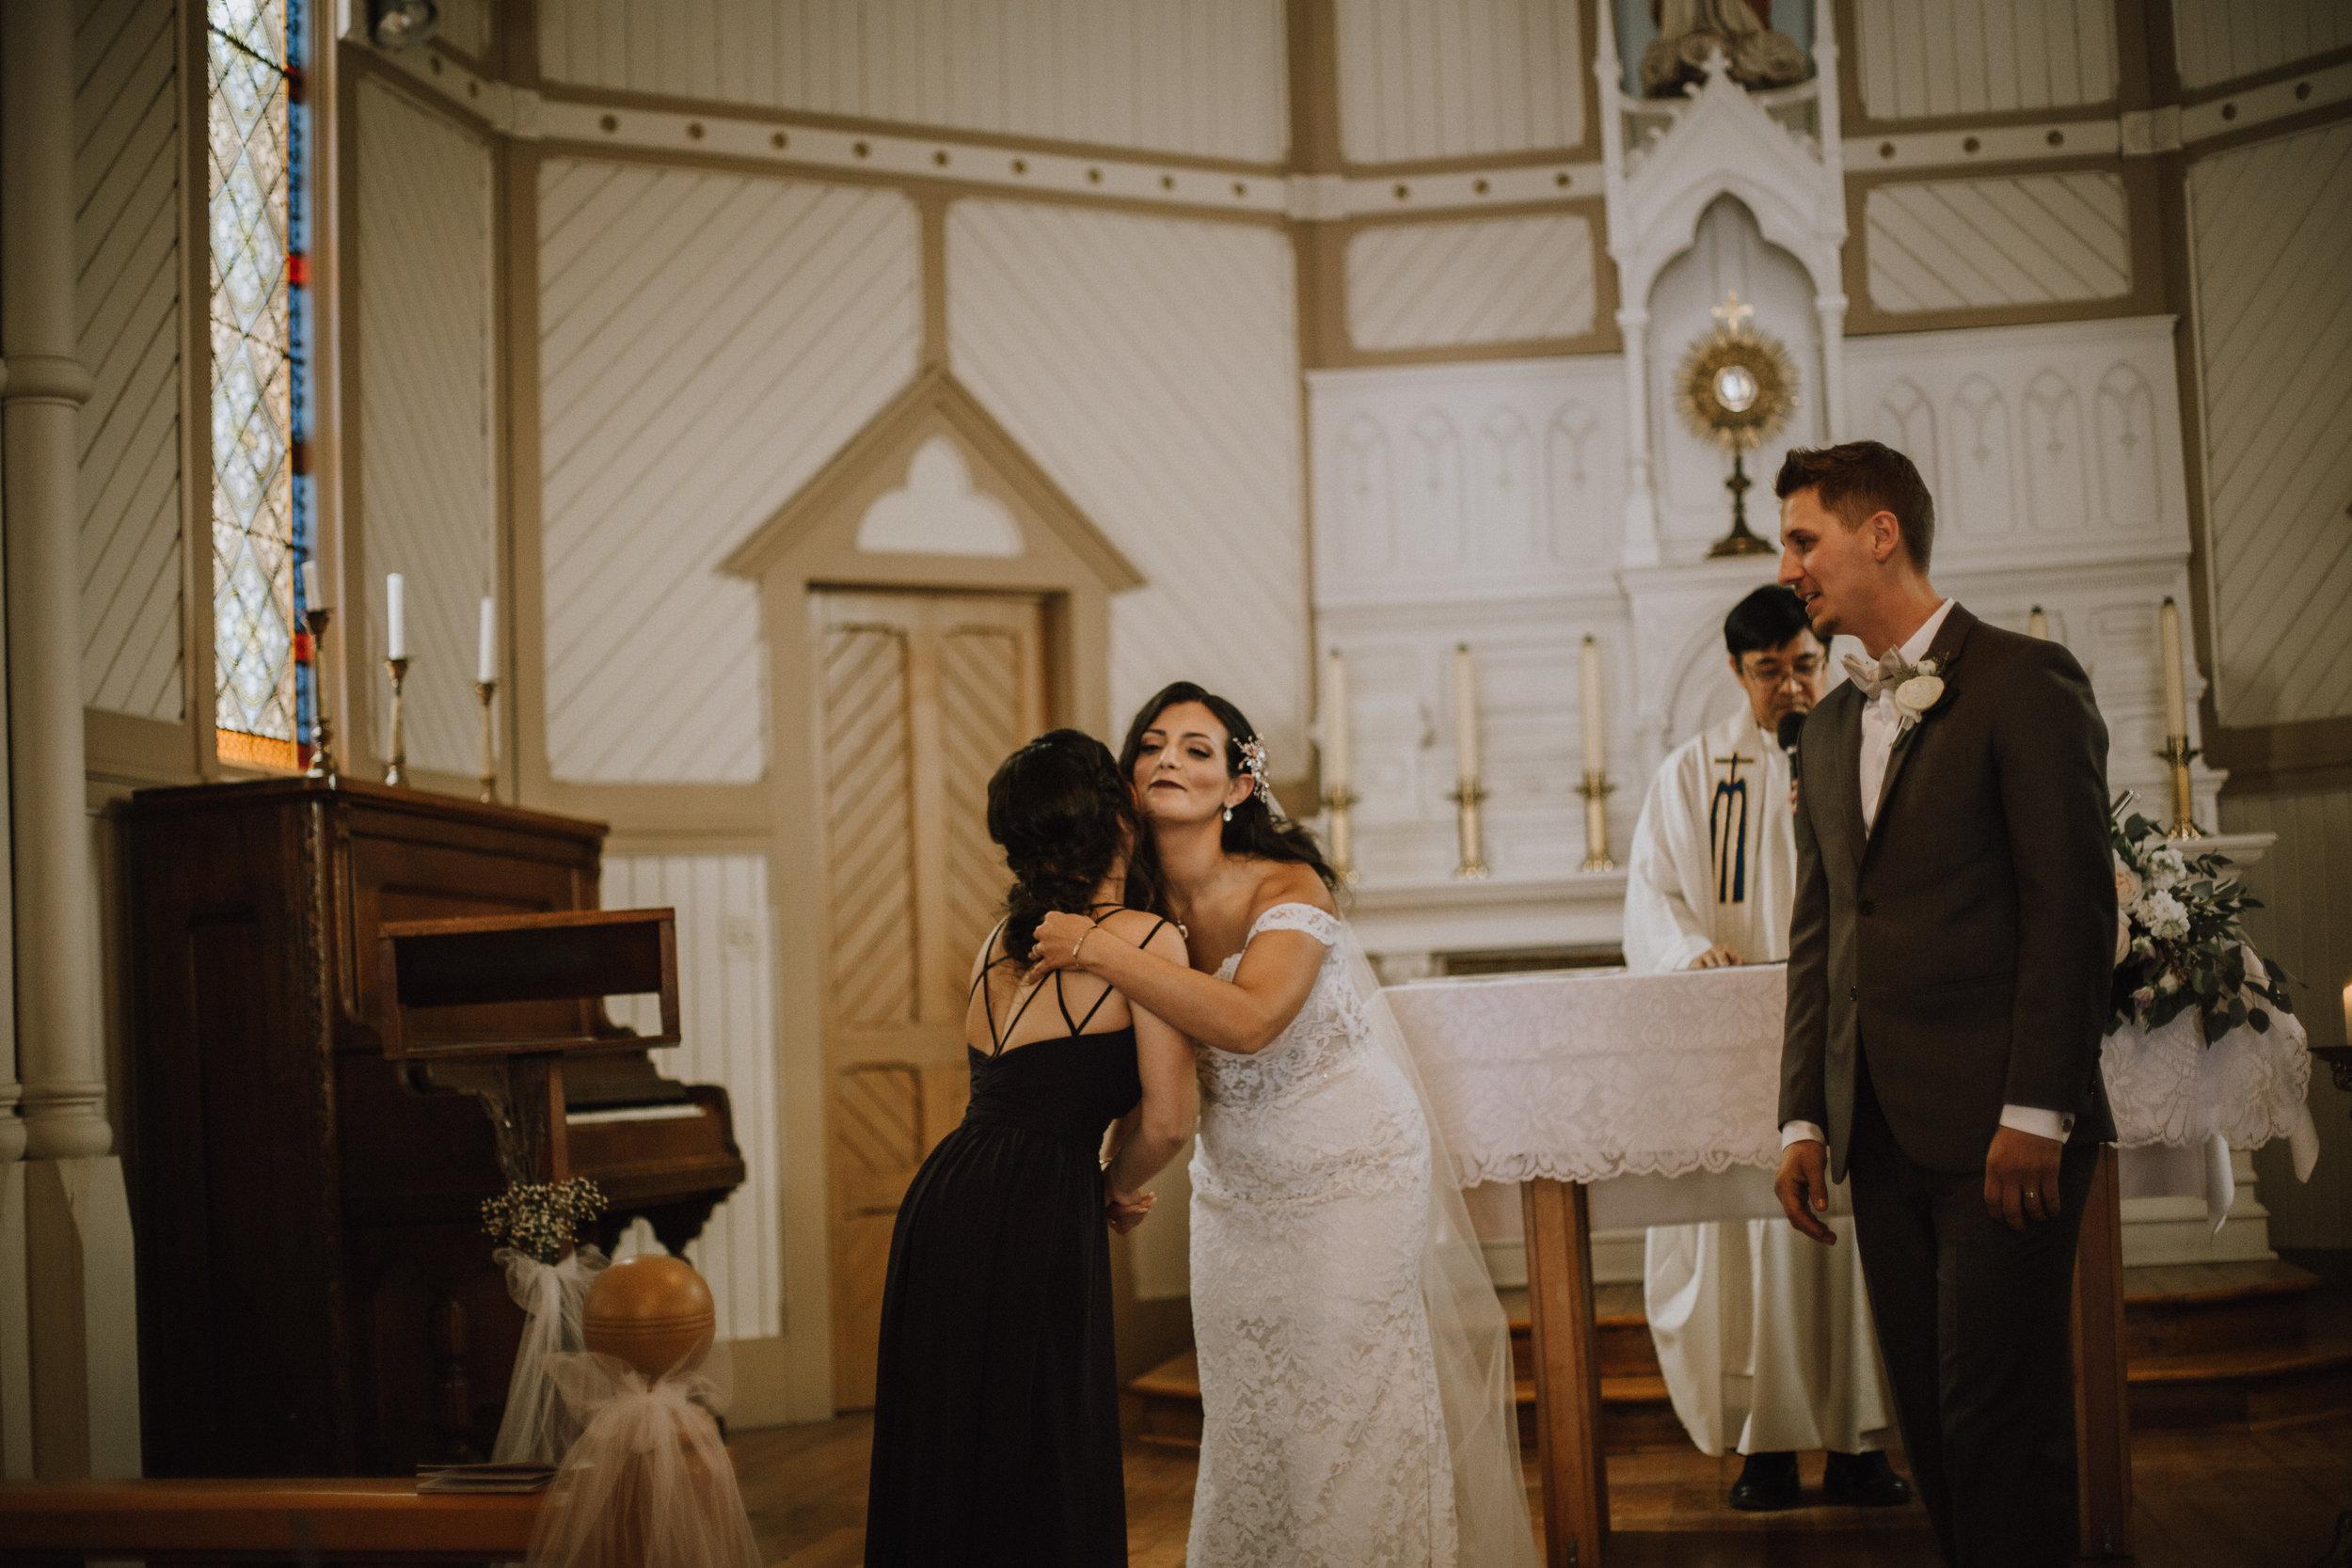 Kurt + Melissa 2 - Ceremony-155.jpg